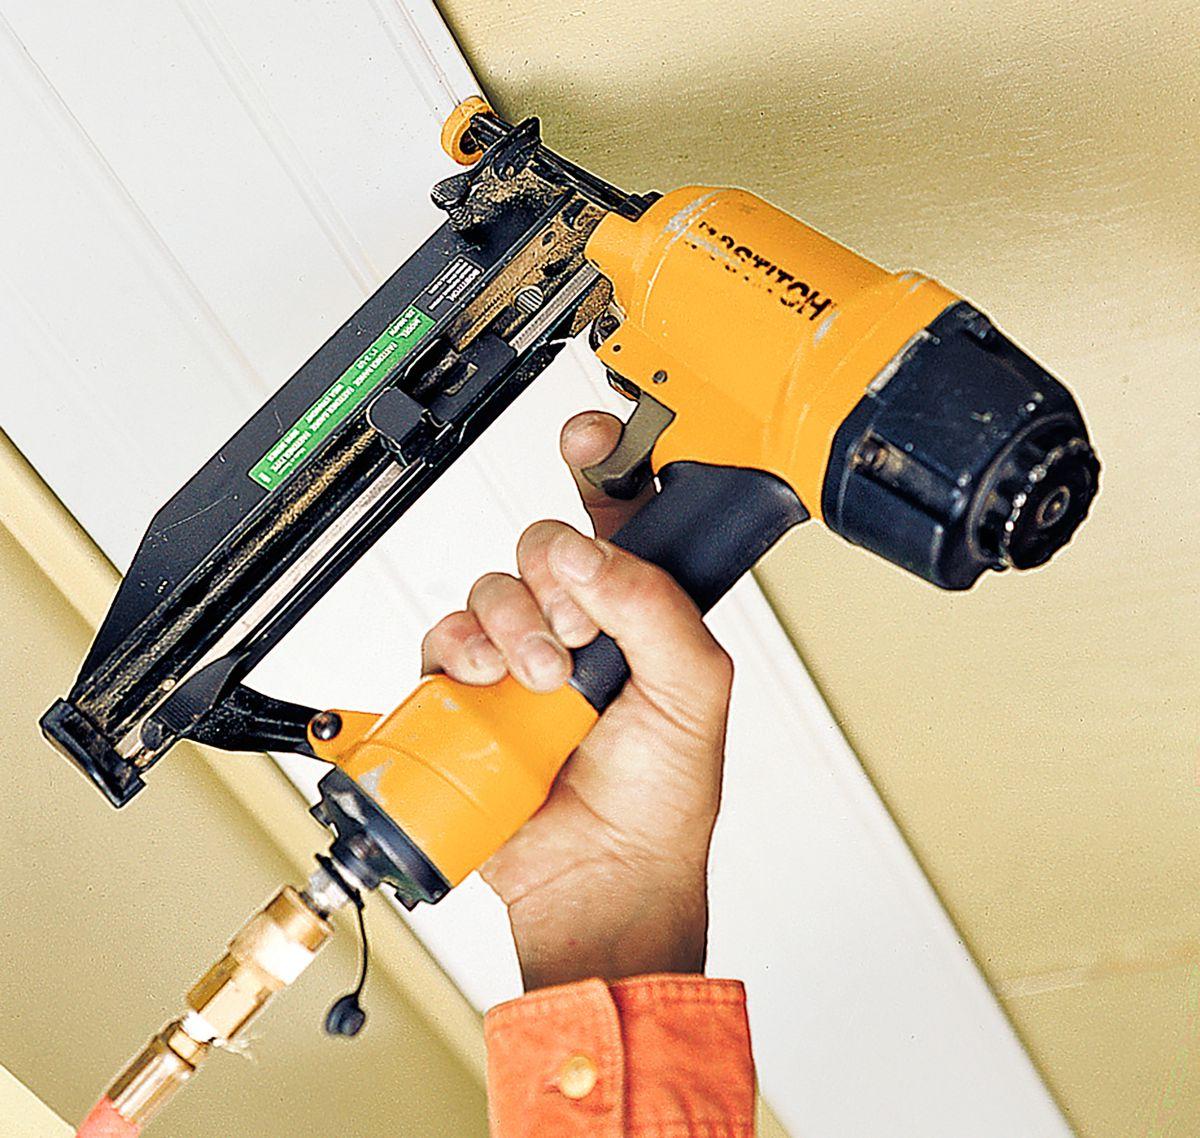 Man Installs Wood Panel